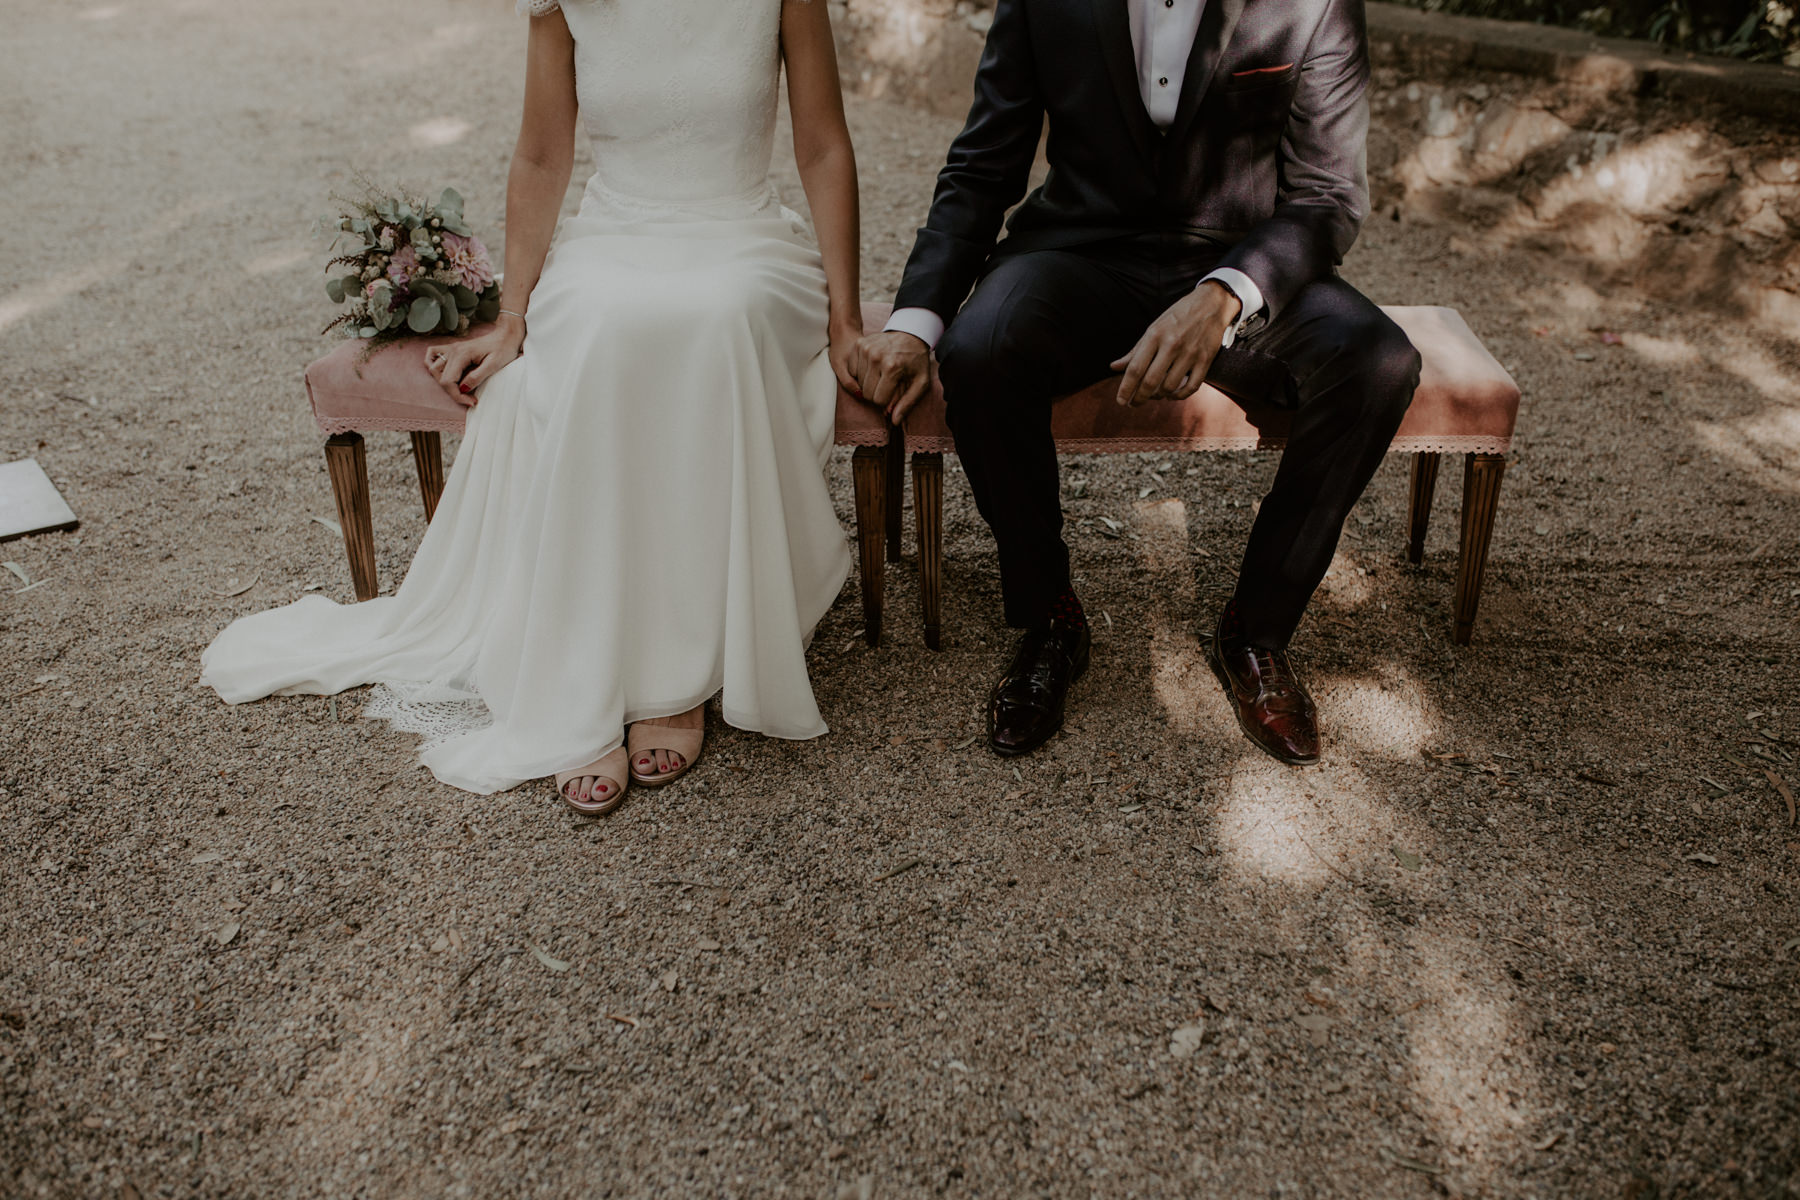 alt_thenortherngirlphotography_couples_weddingphotographer_photographer_wedding_boda_fotografodebodas_fotografobodasbarcelona_bodaindie_bodasconestilo_bodaensantperedeclara_jennifermiguel-305.jpg